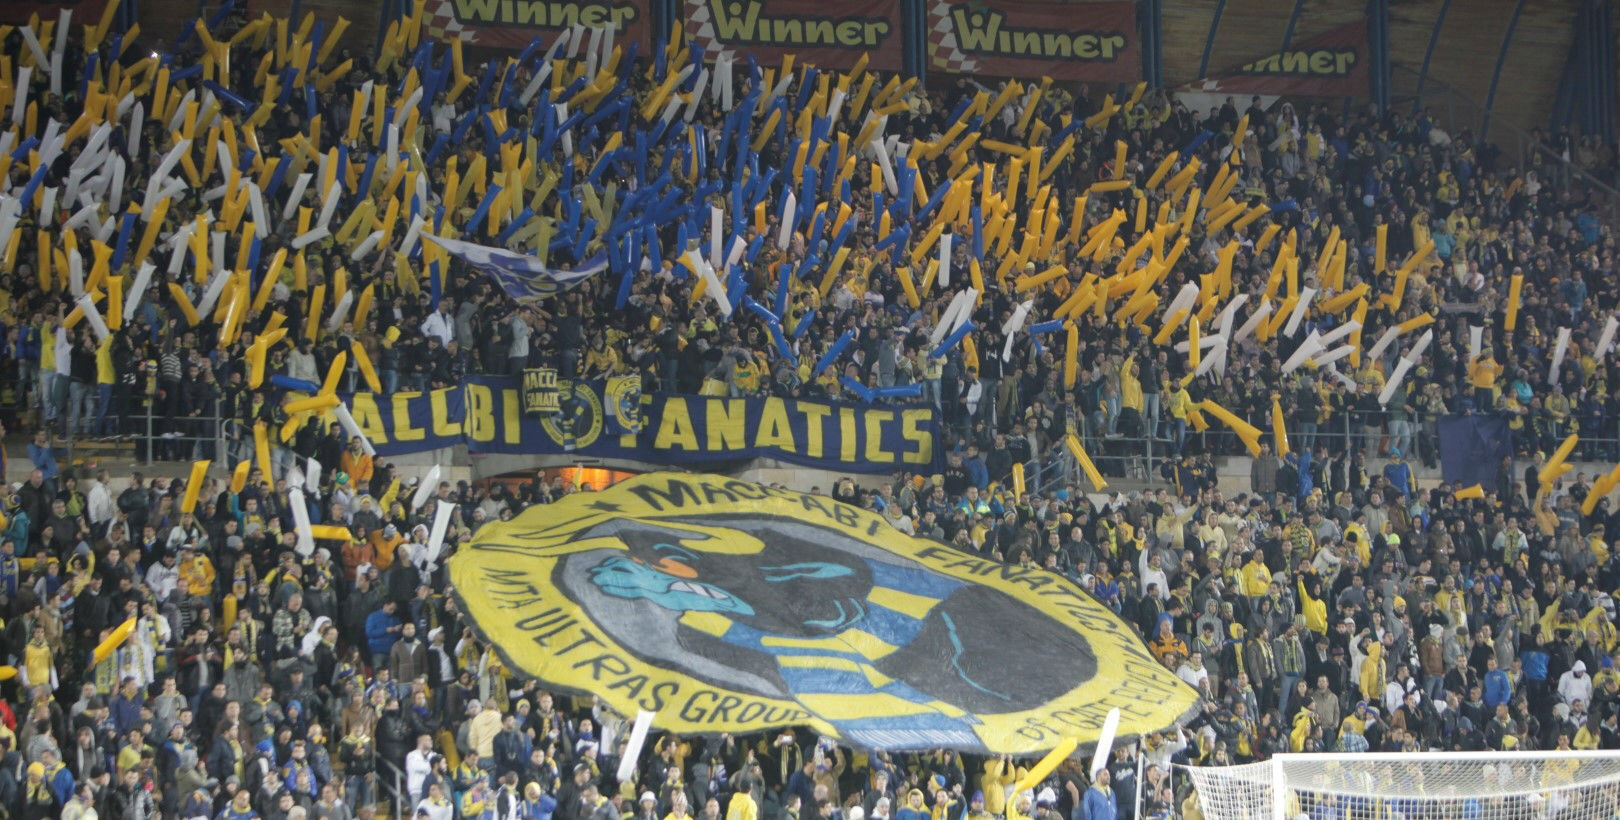 Maccabi Tel Aviv fans at Teddy Stadium-courtesy Maccabi Tel Aviv website